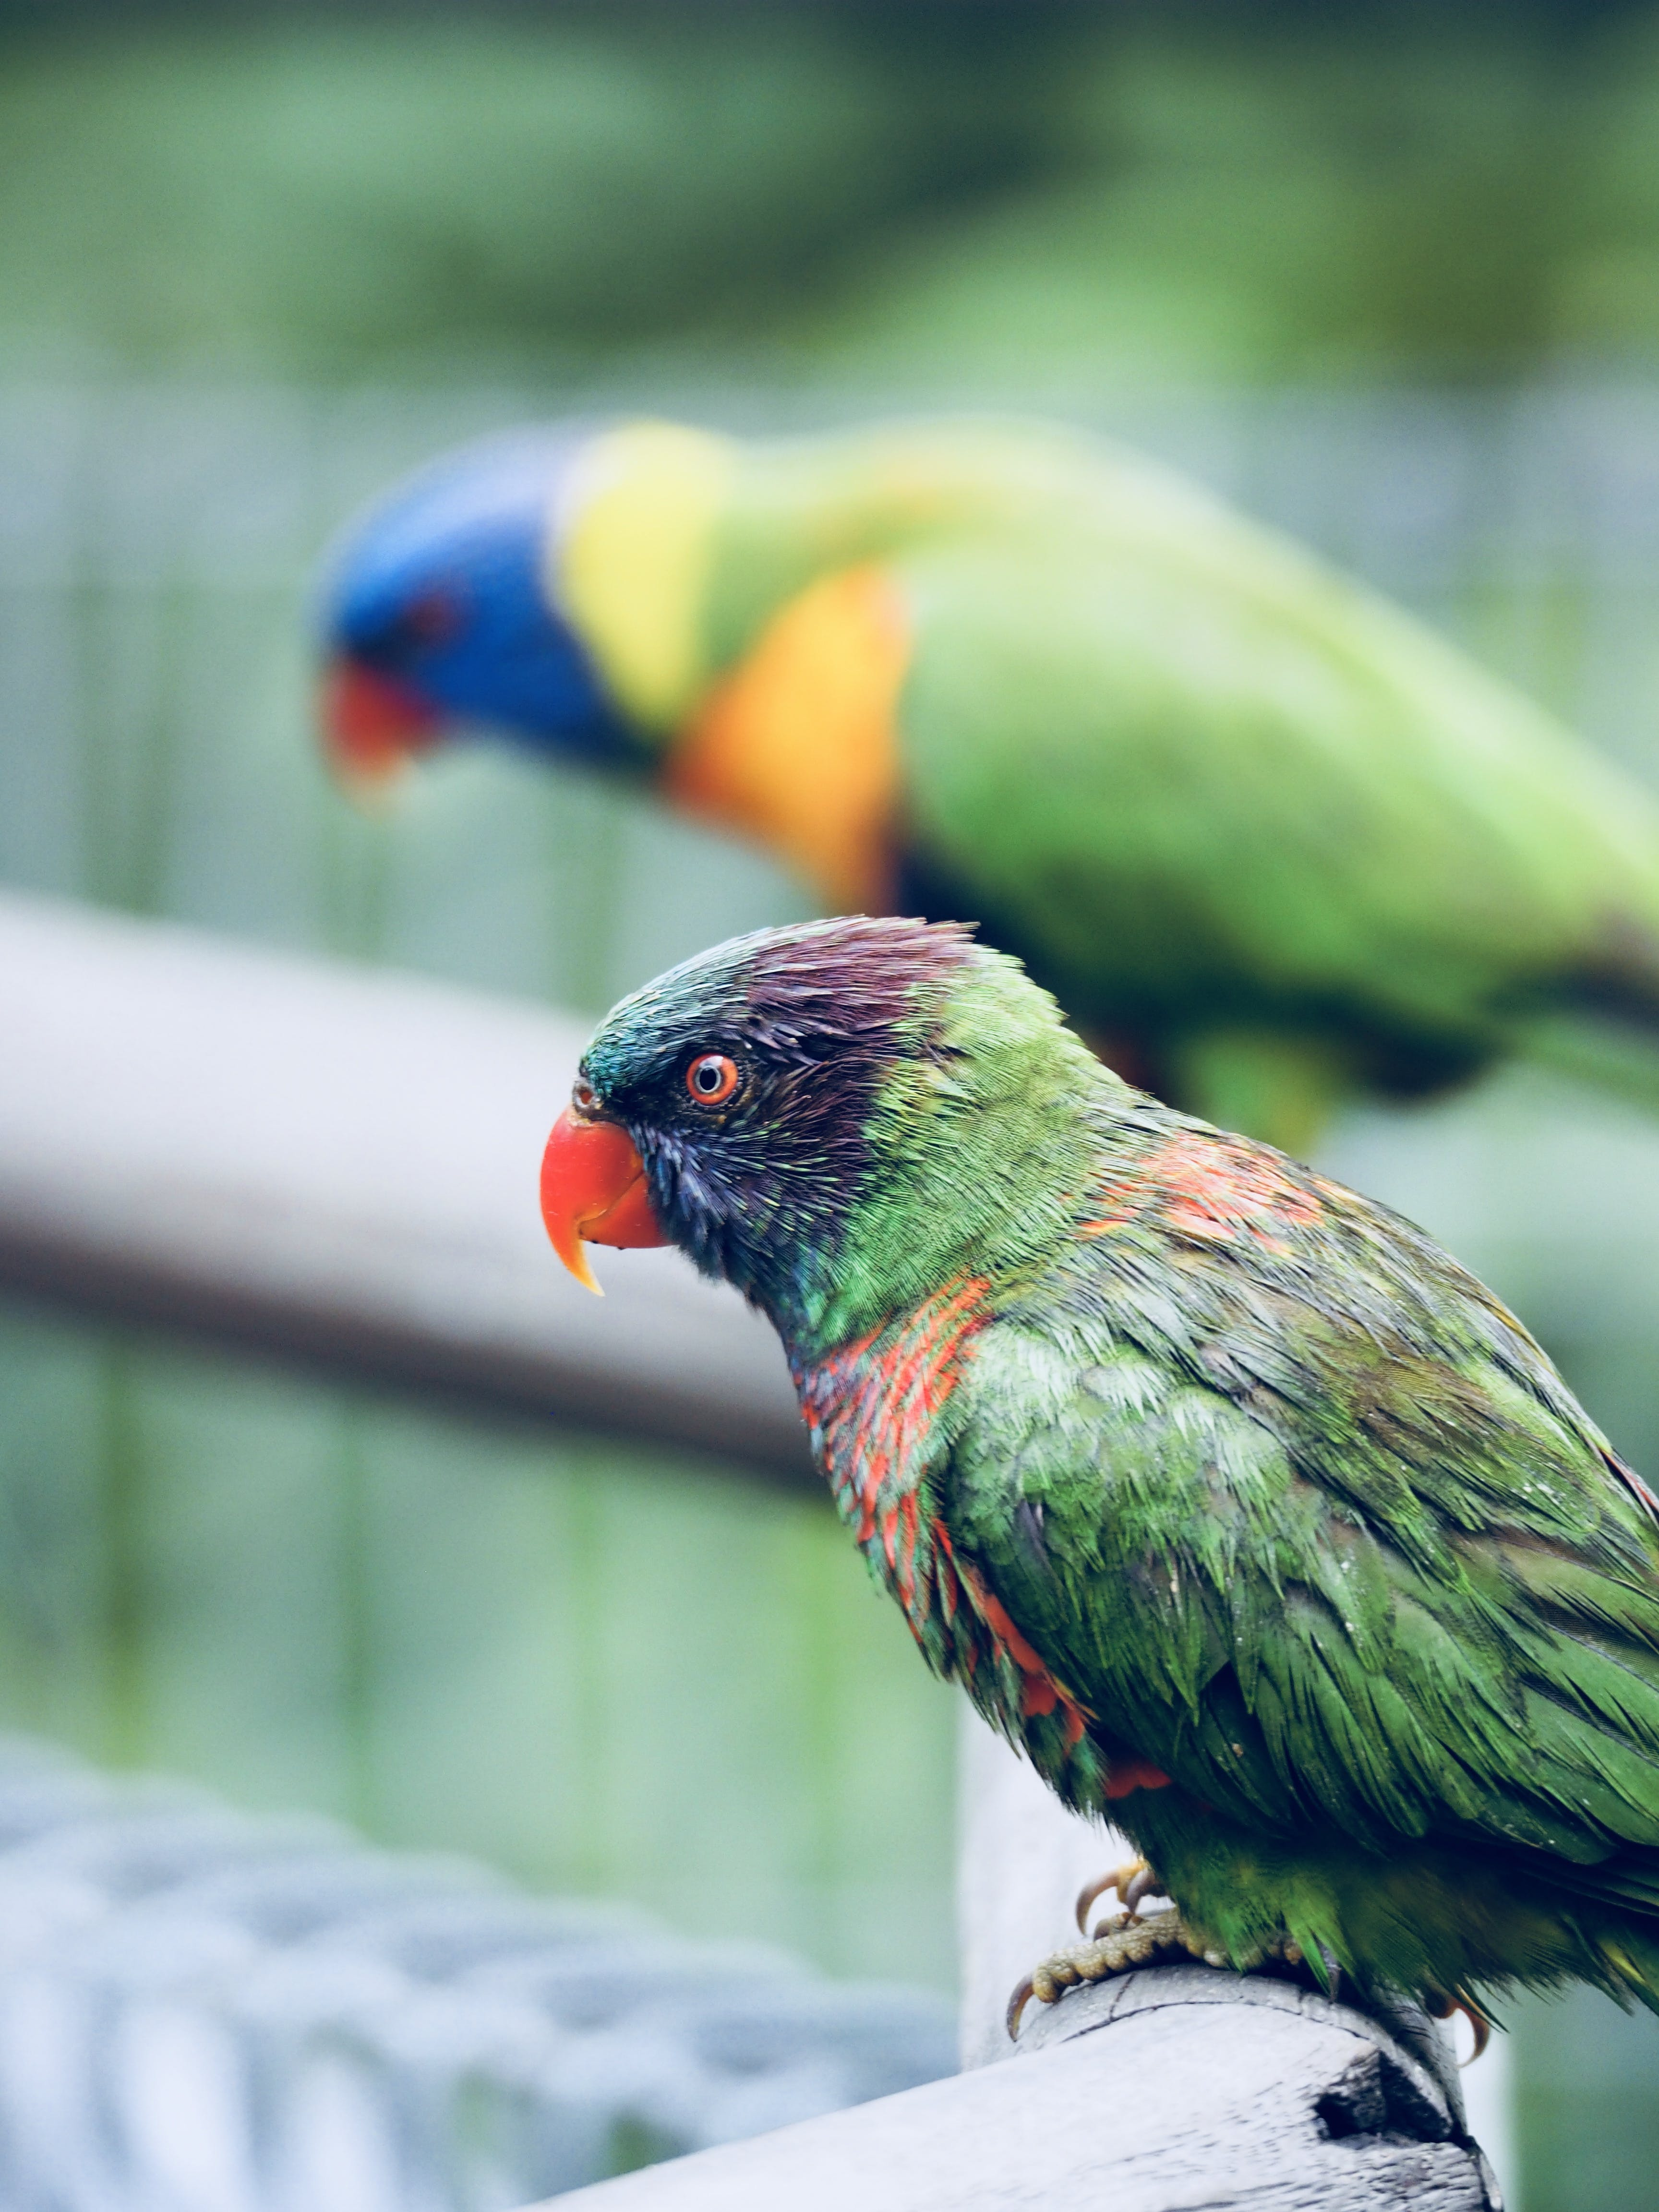 Tilt Shift Lens Photography of Green Short Beak Bird